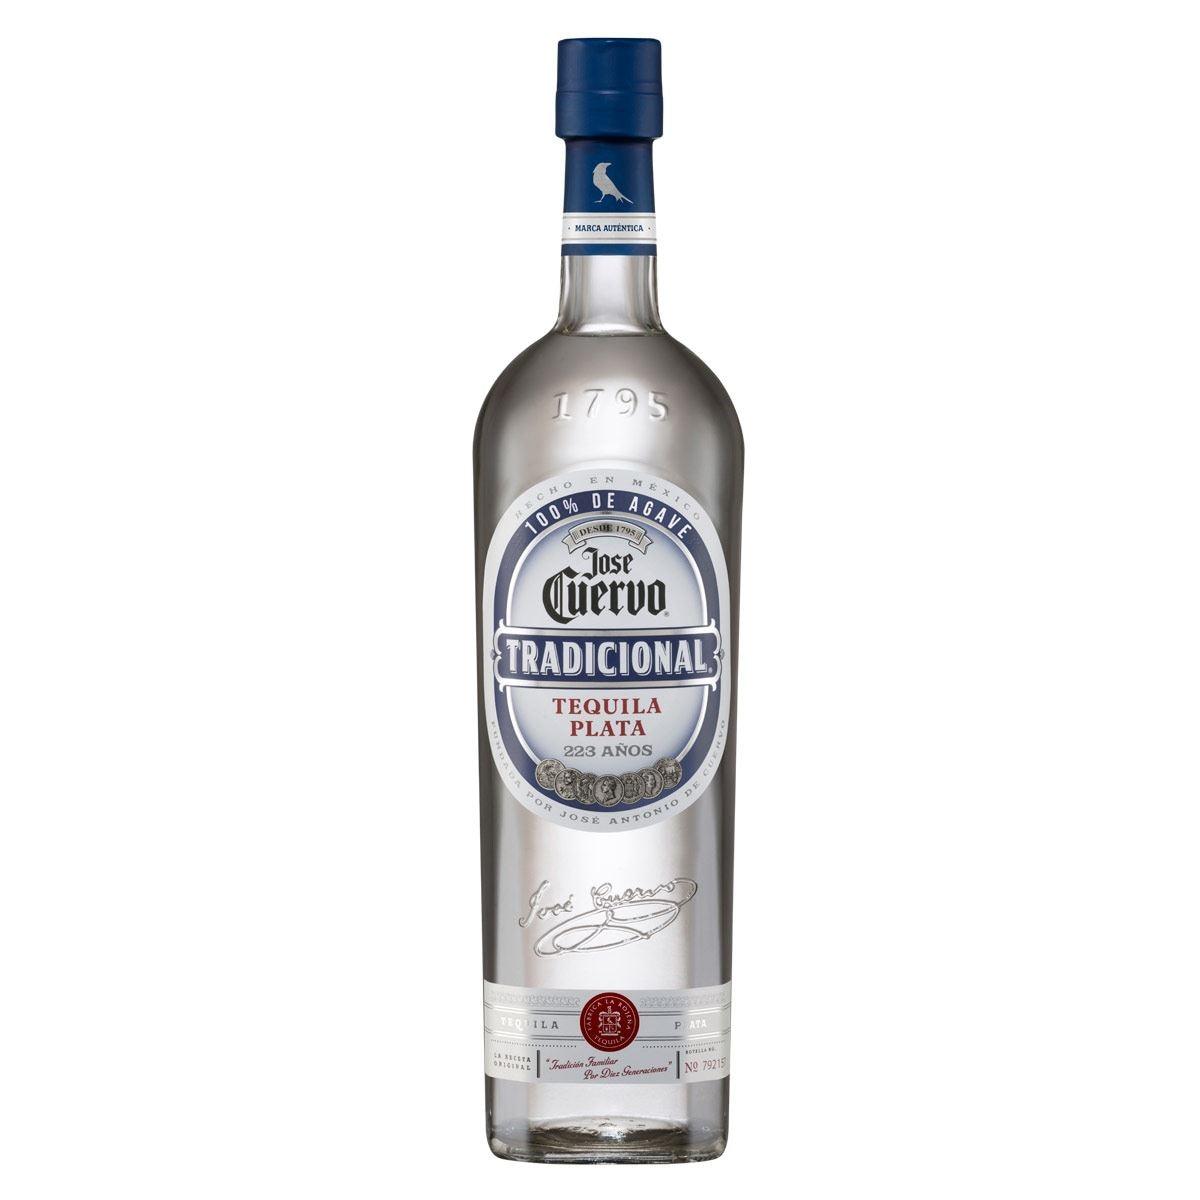 Tequila Jose Cuervo Tradicional Plata  950 ml